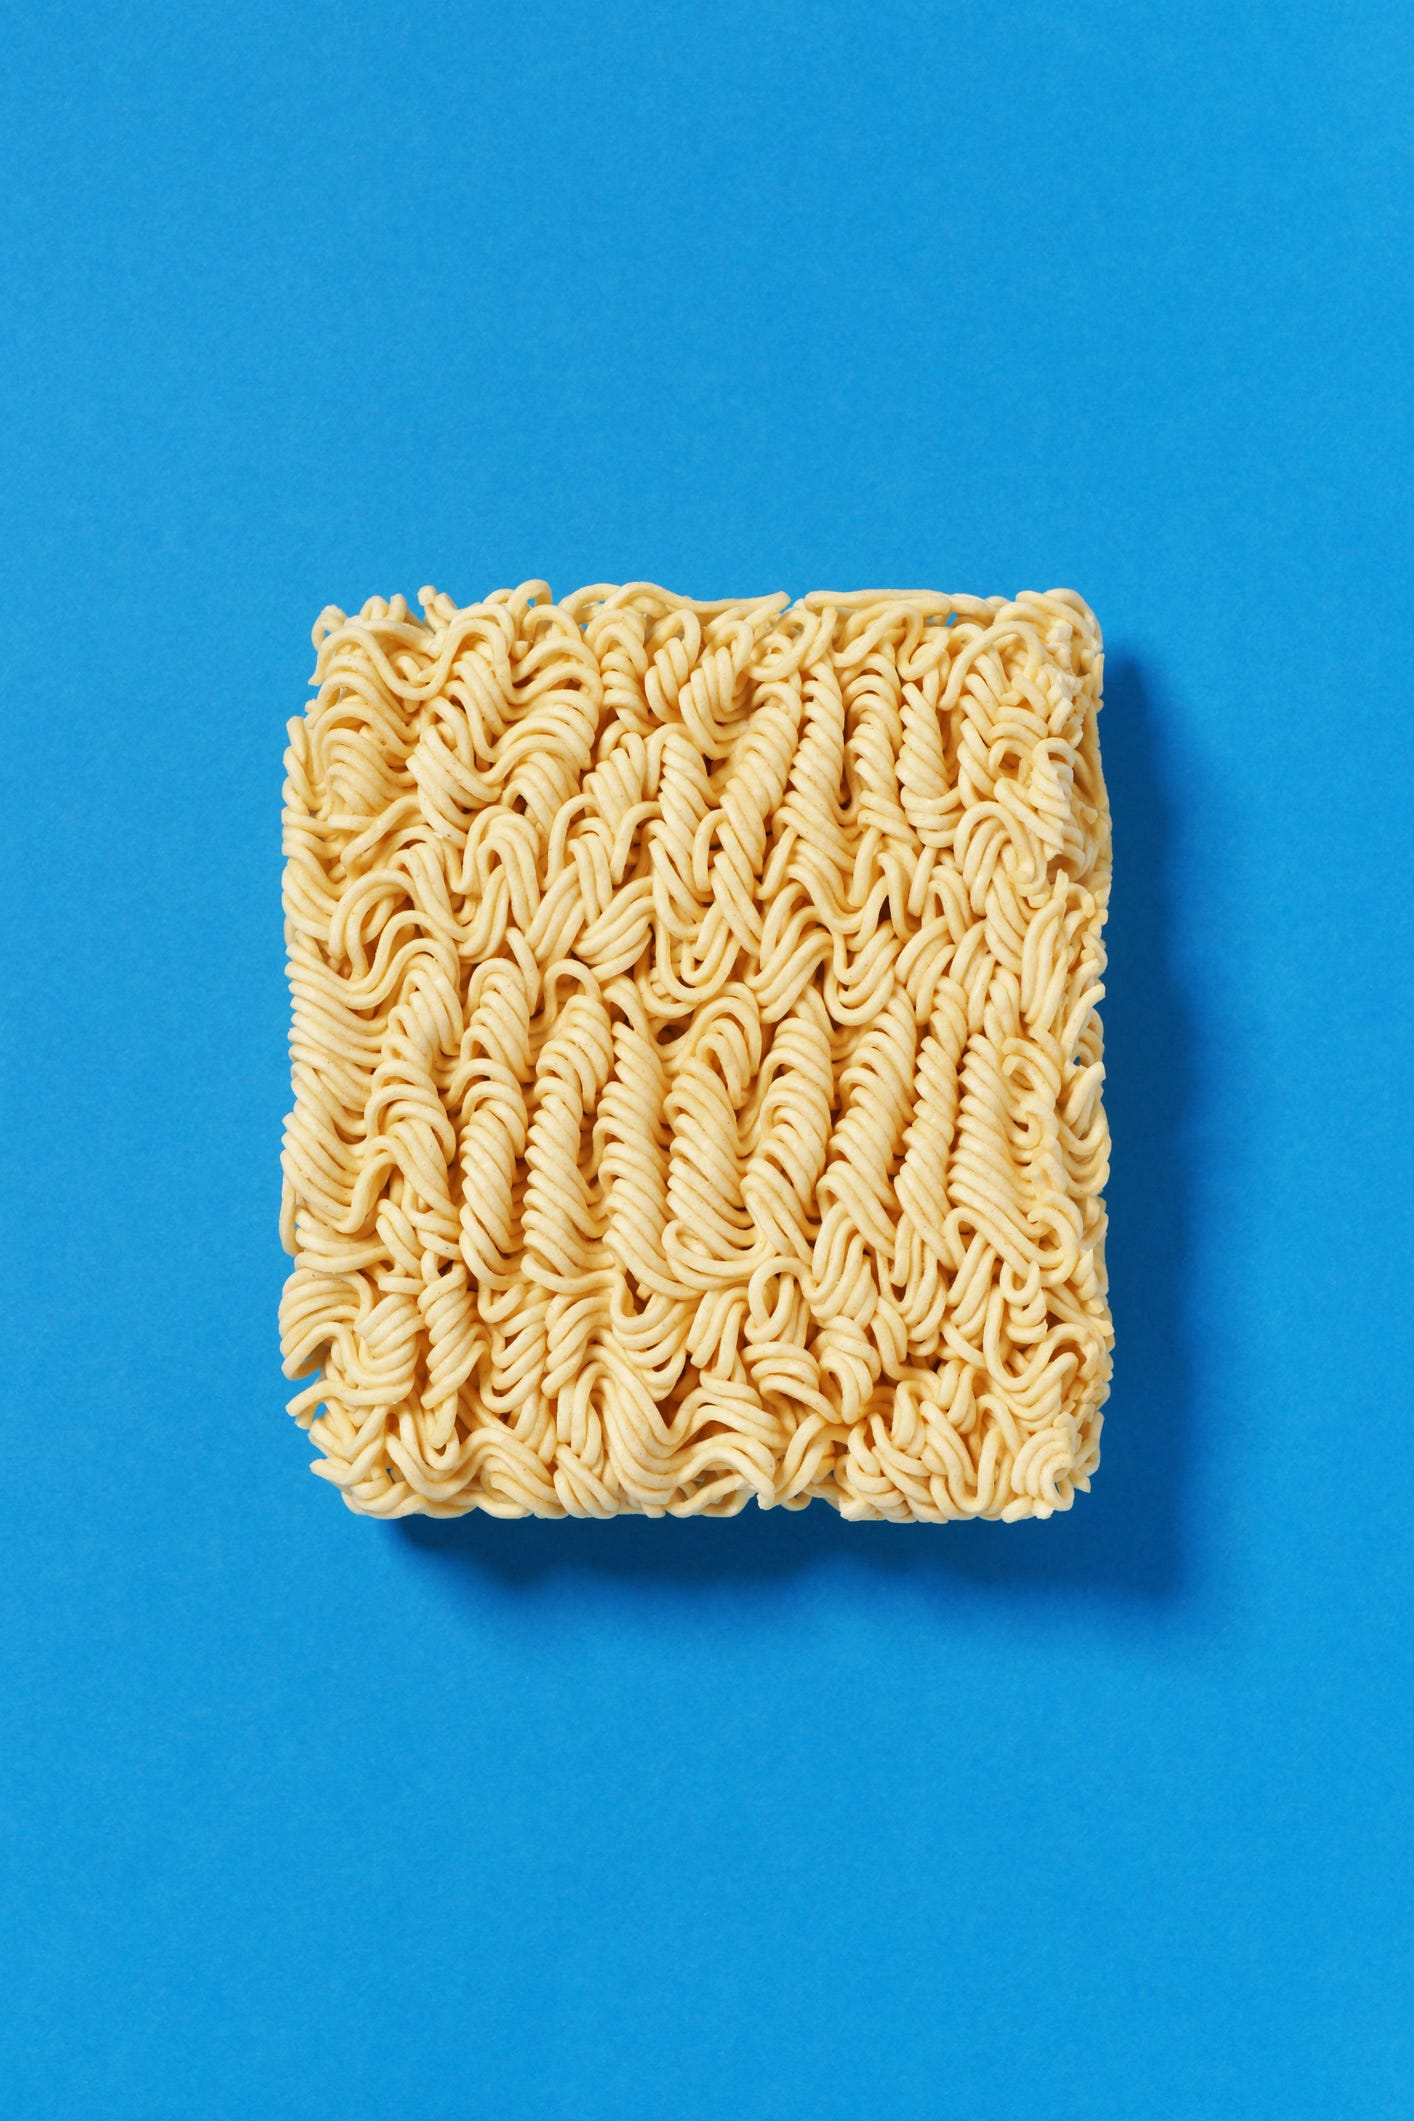 Nearly $100,000 worth of ramen noodles stolen in tractor trailer heist